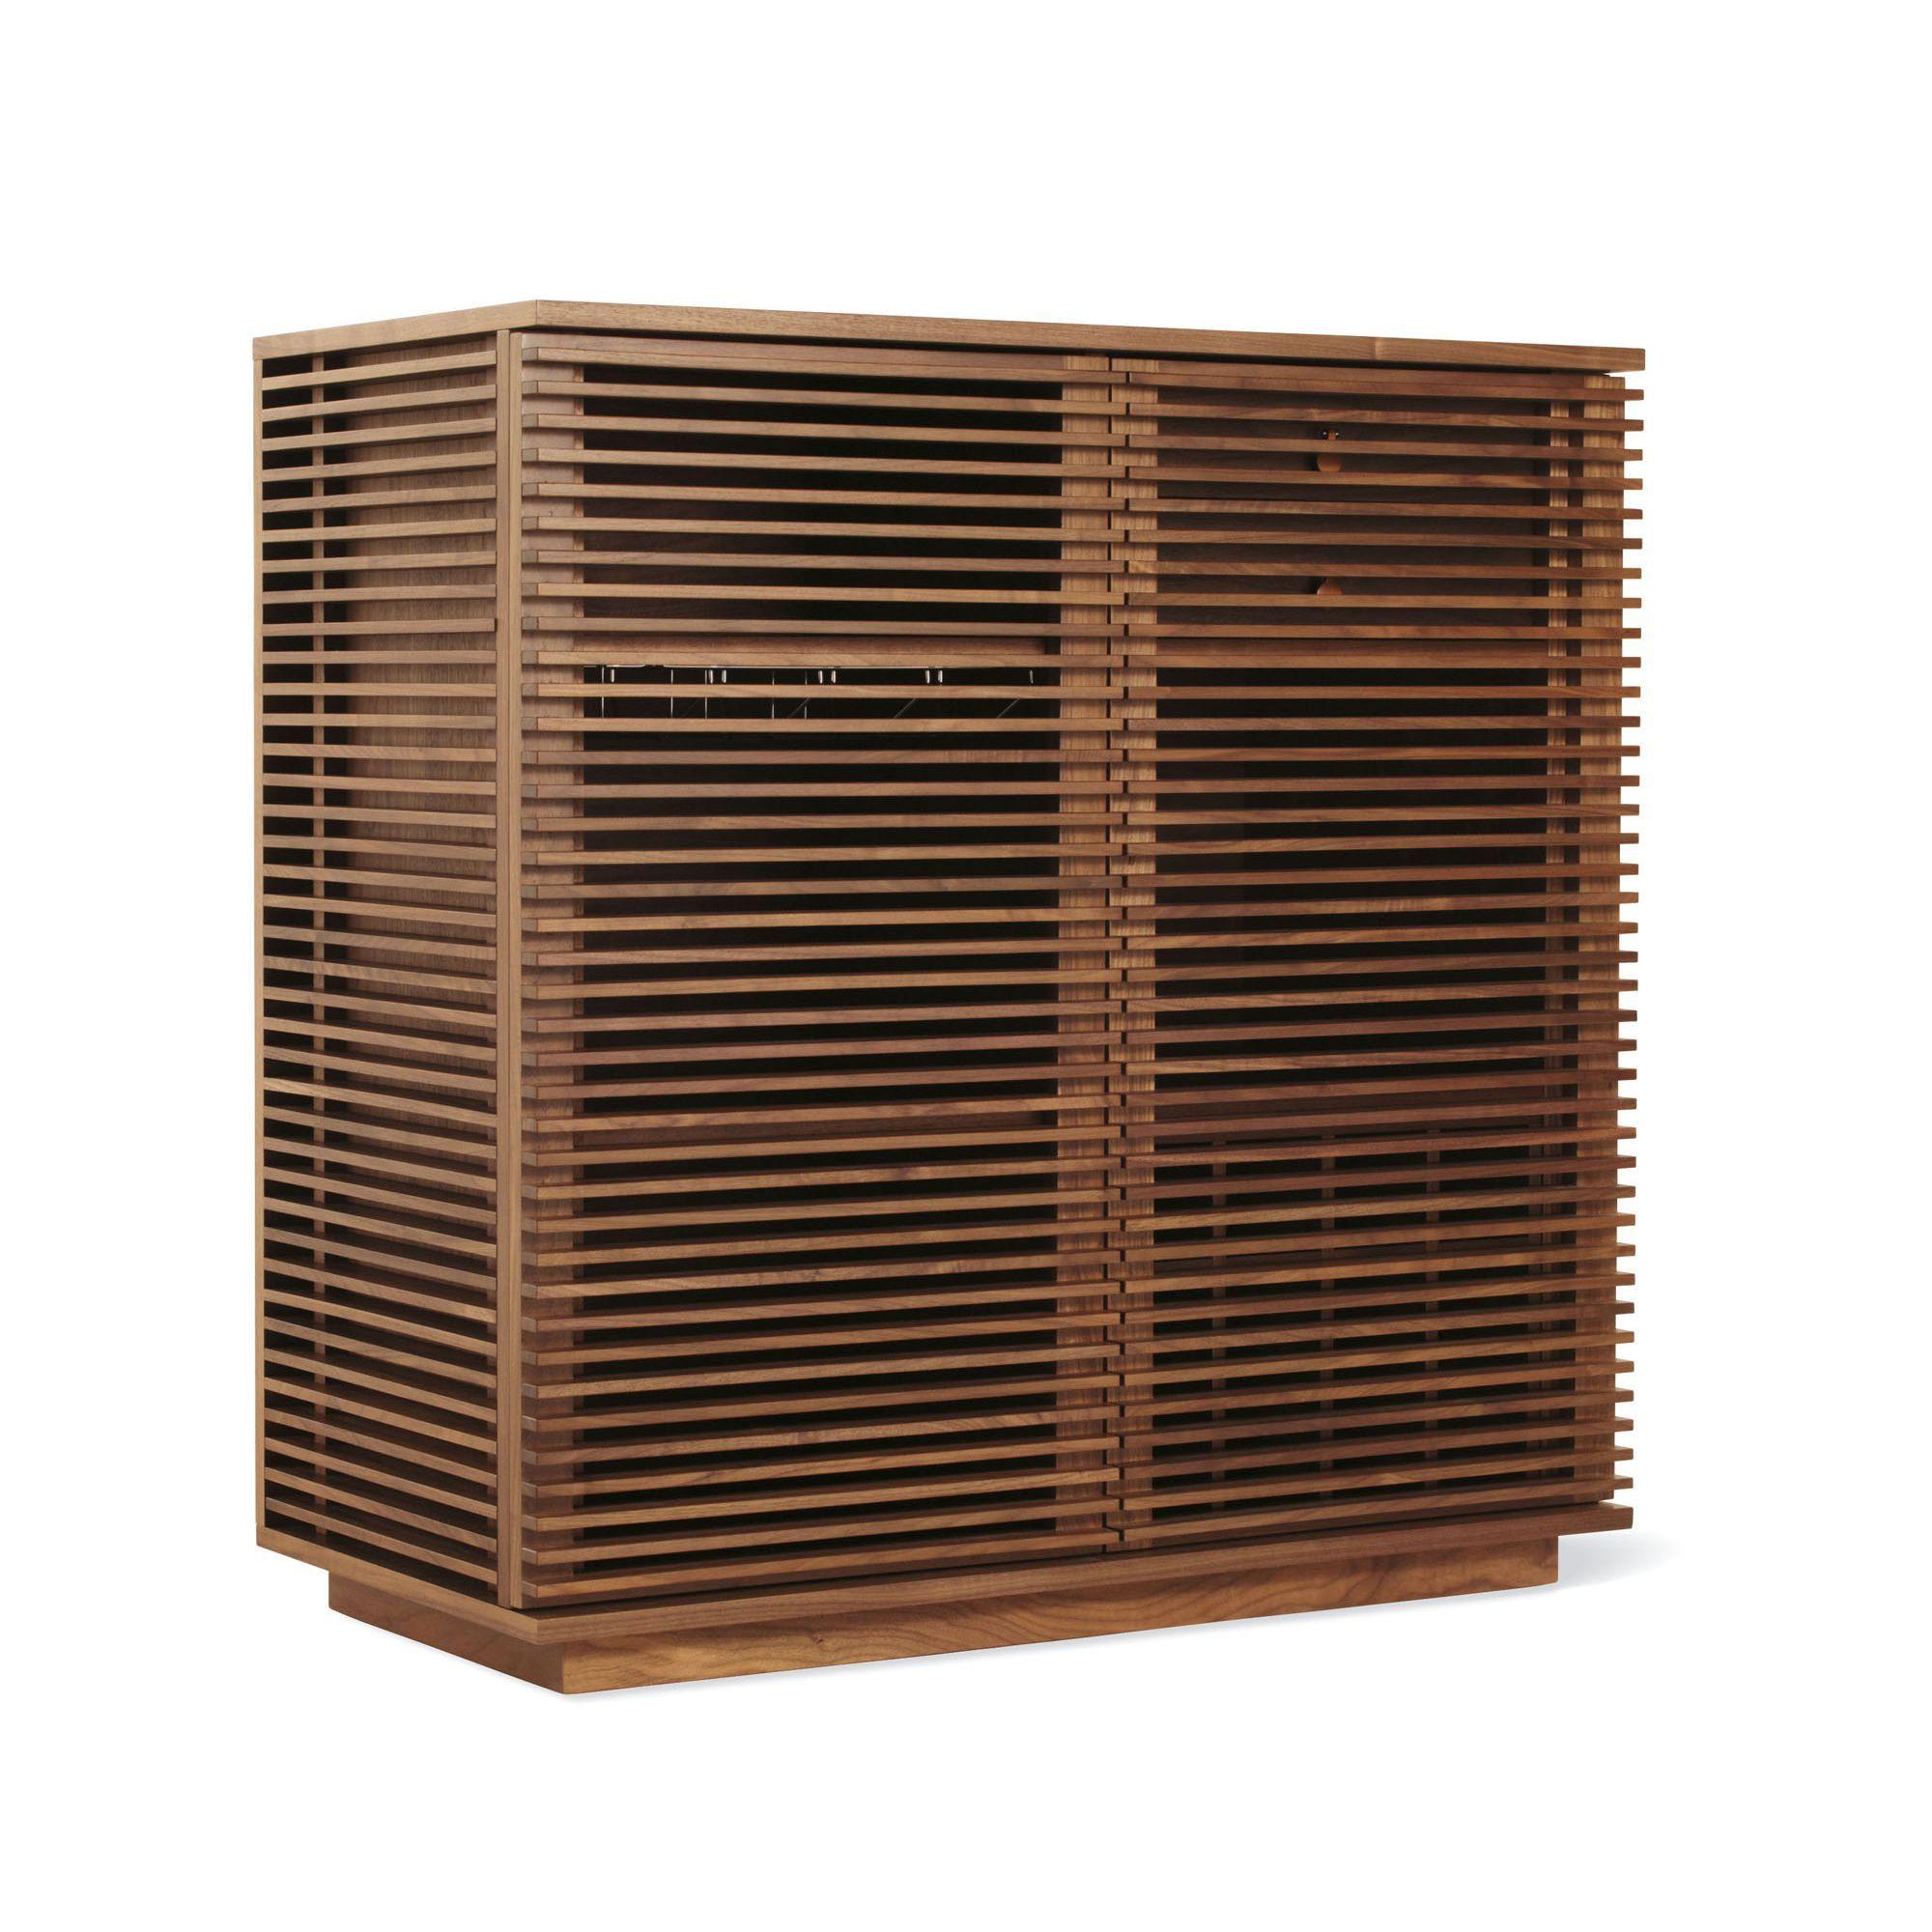 Line Bar Modern Cabinet